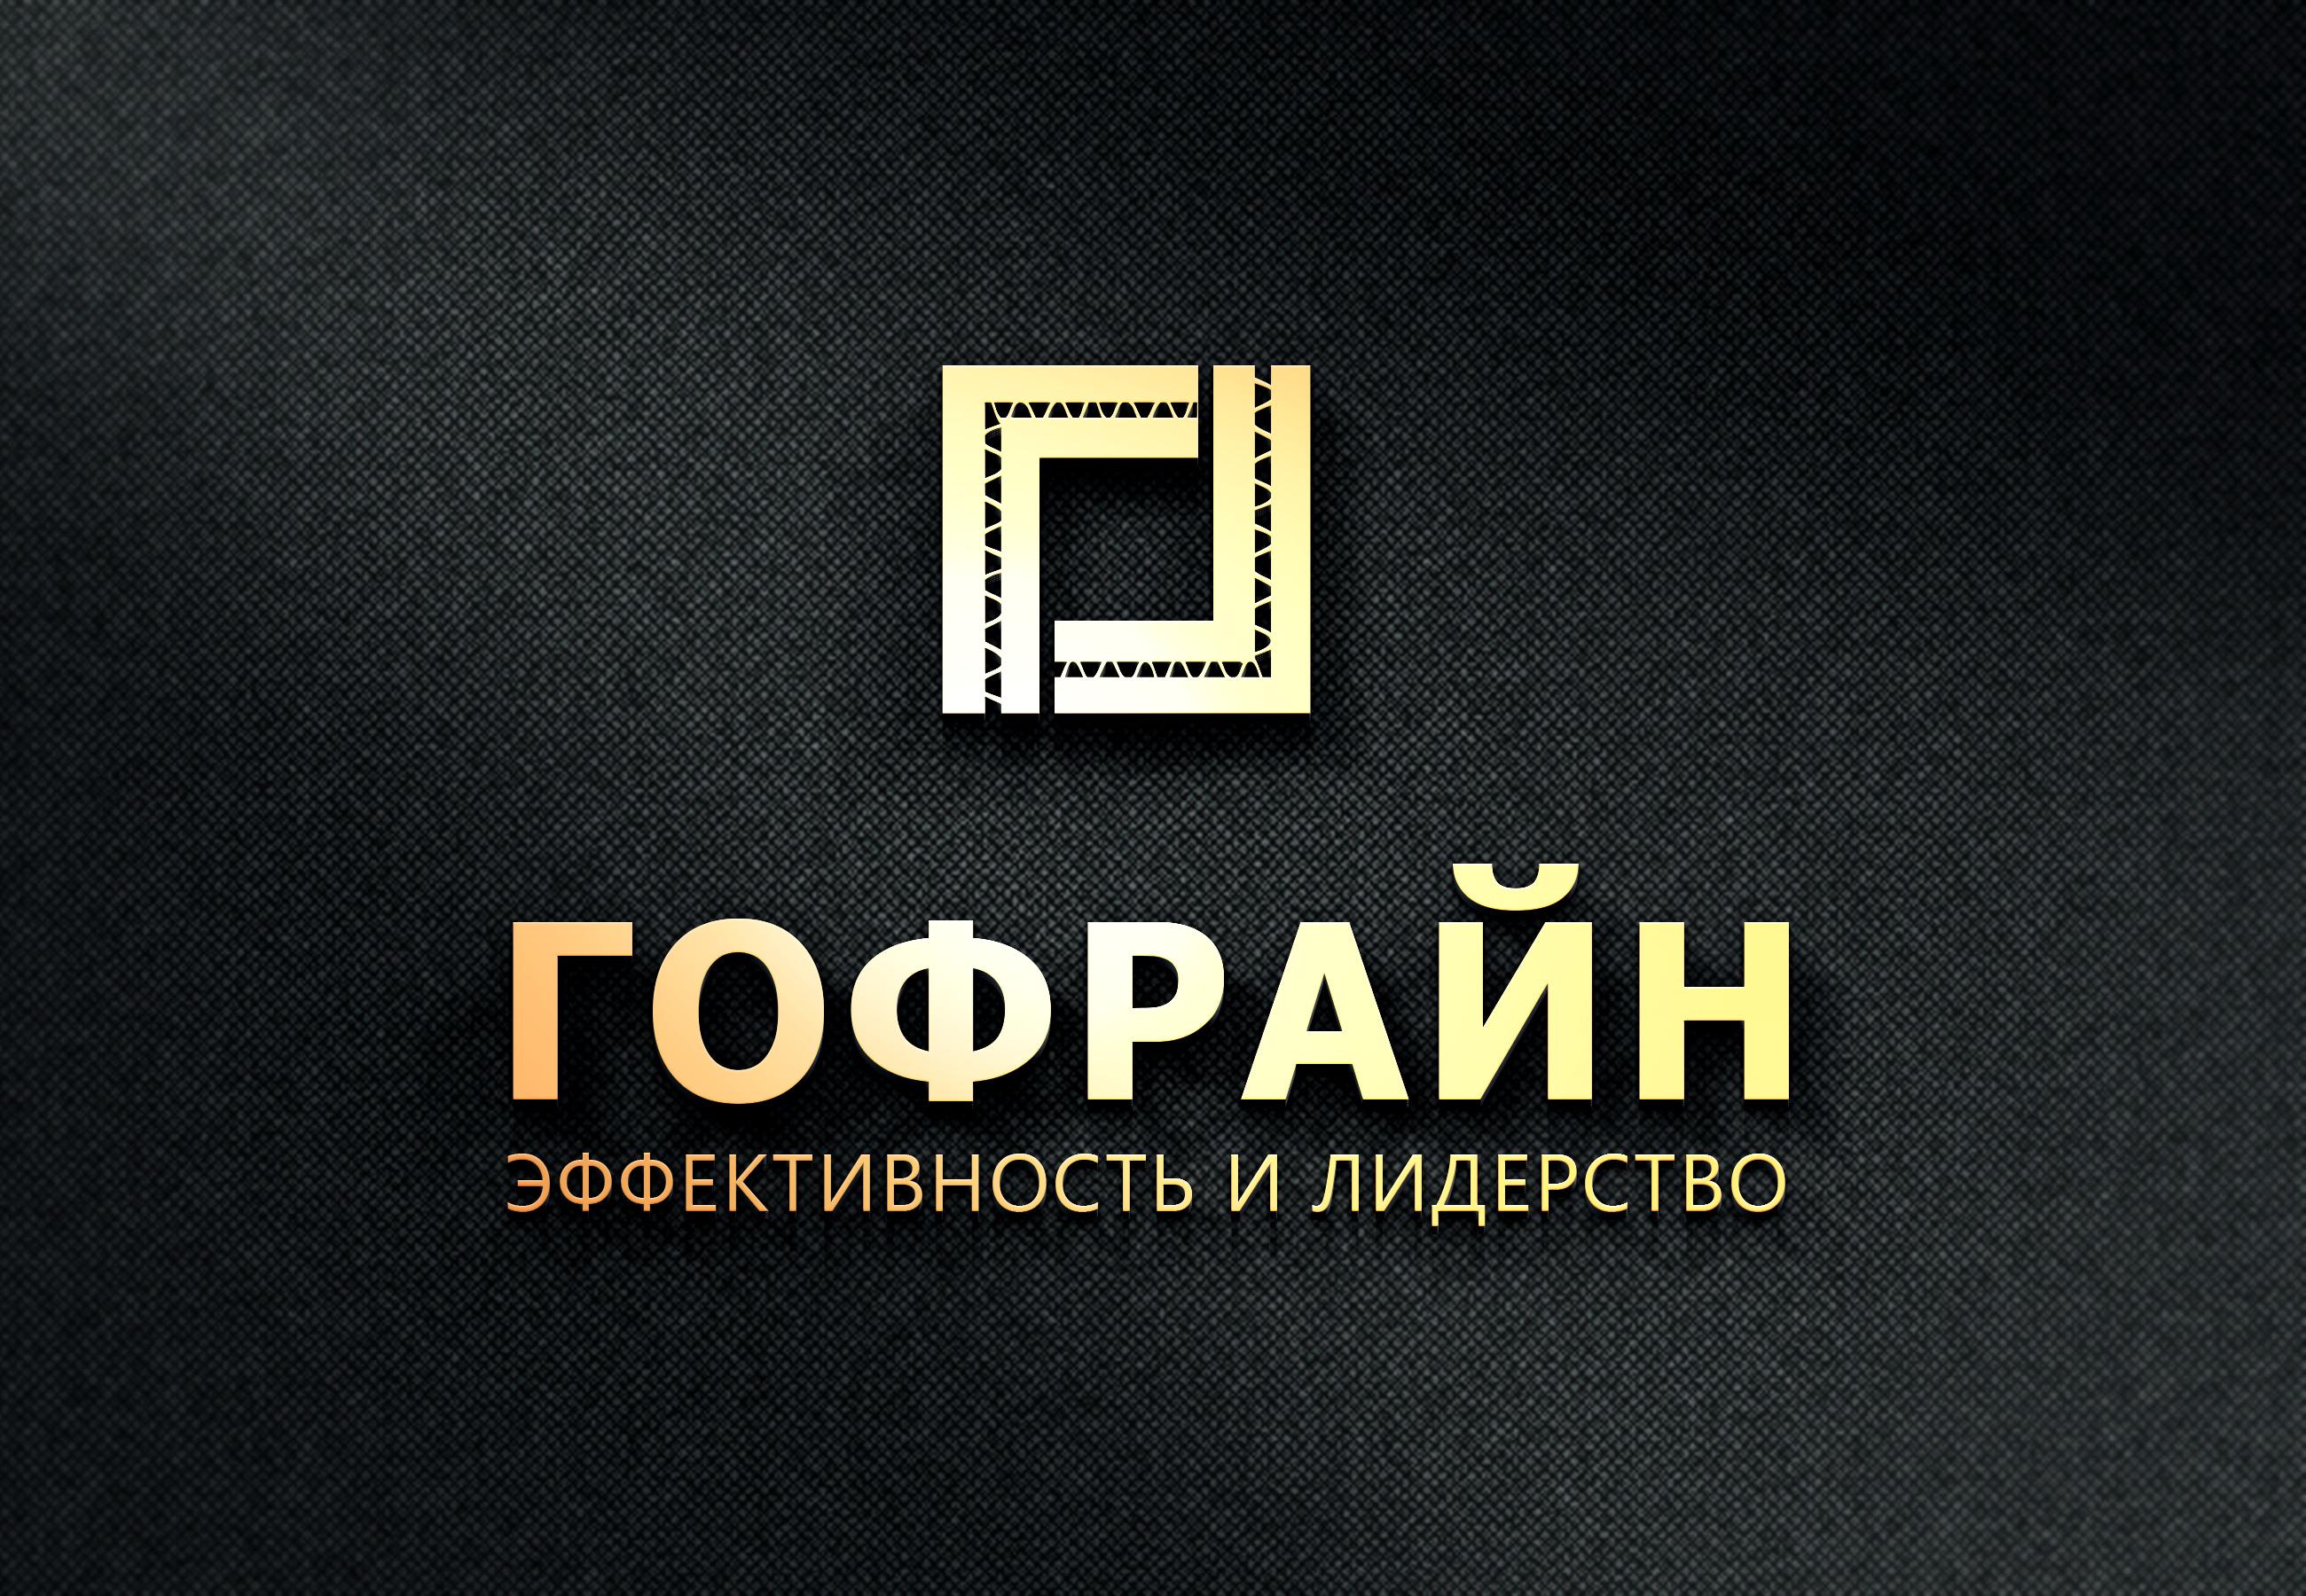 Логотип для компании по реализации упаковки из гофрокартона фото f_4885cdc6d1c9c1c5.jpg